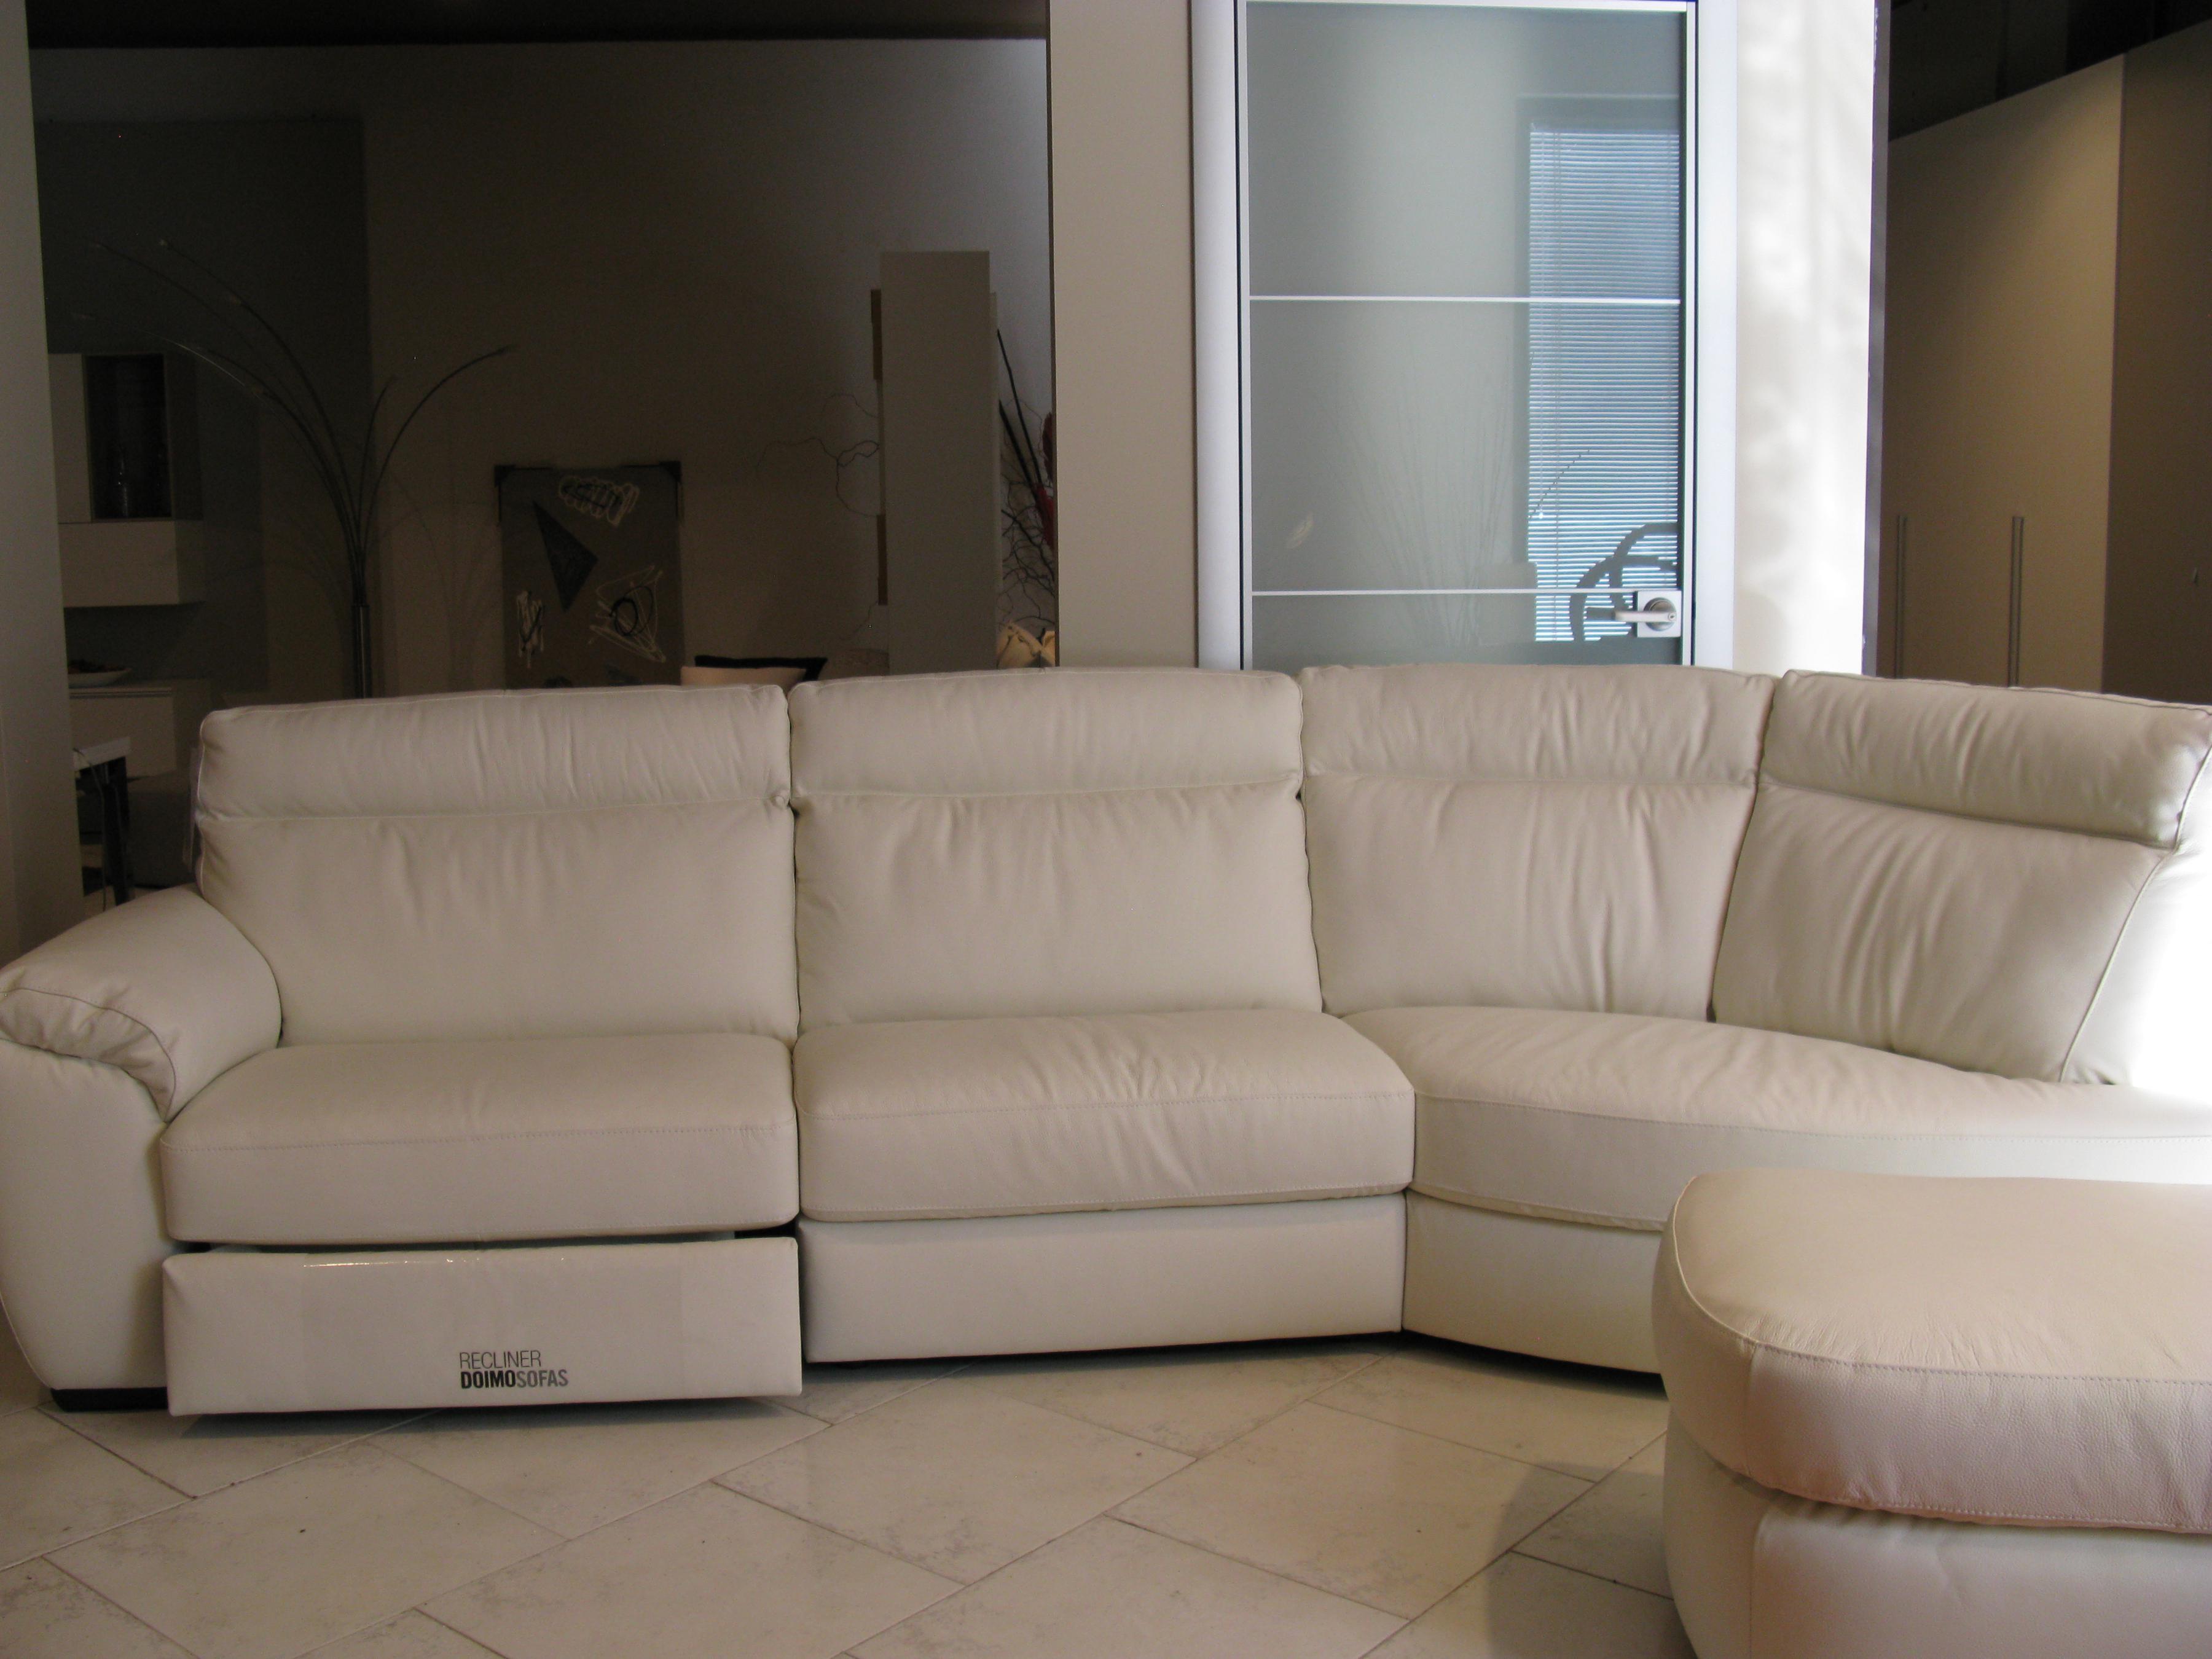 Divano doimo sofas charles divano pelle divani a prezzi scontati - Divano doimo prezzo ...